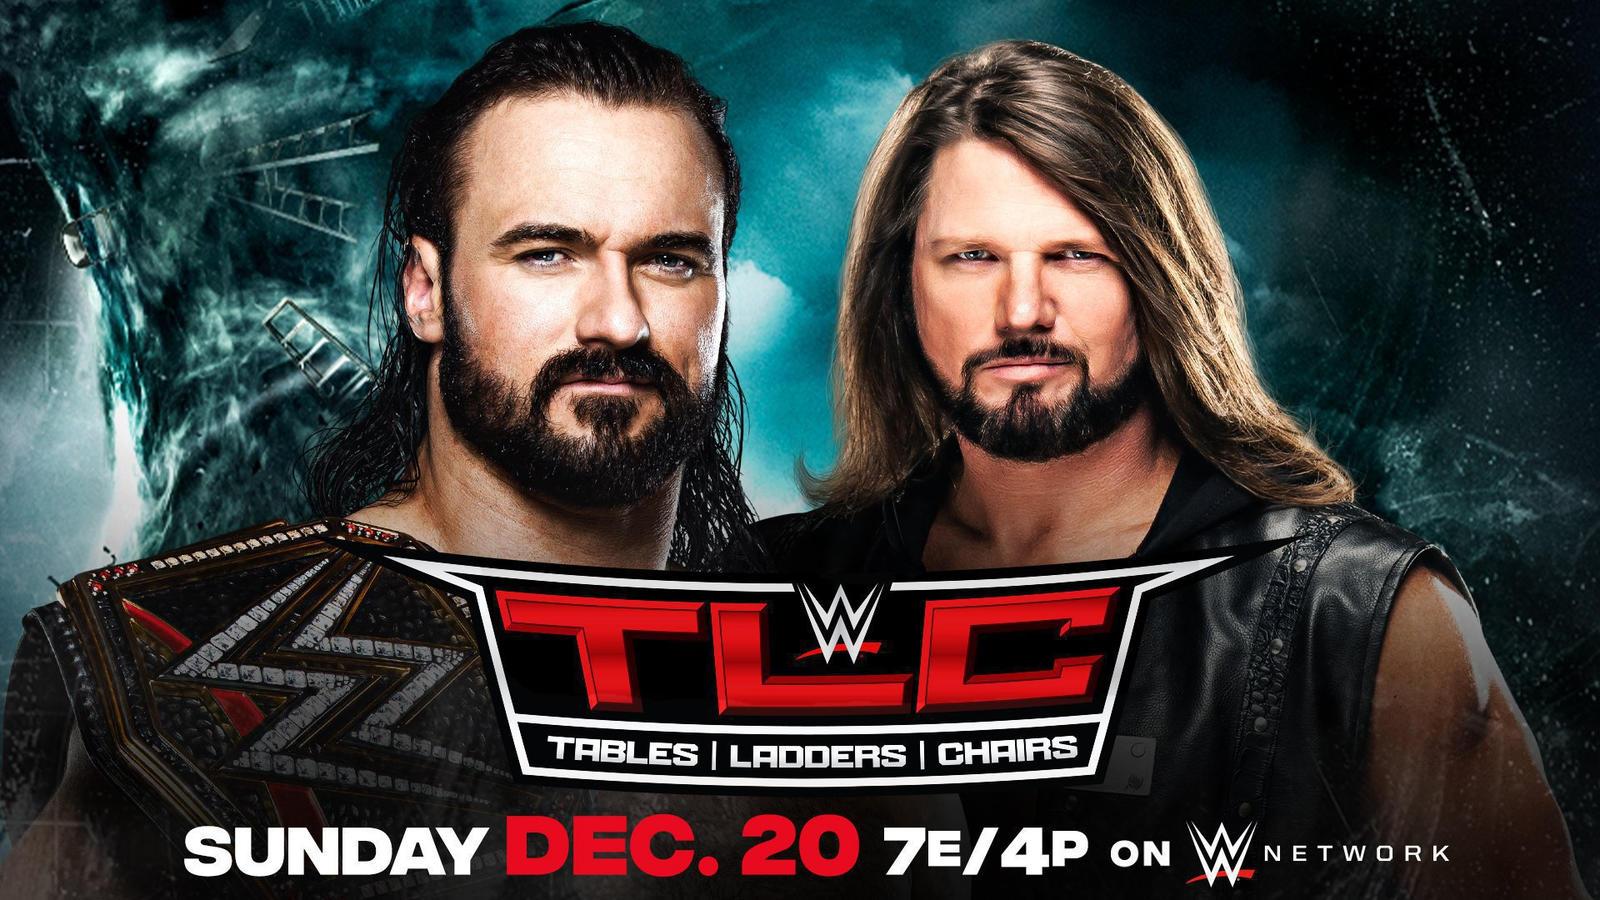 Drew McIntyre and AJ Styles Now a TLC Match